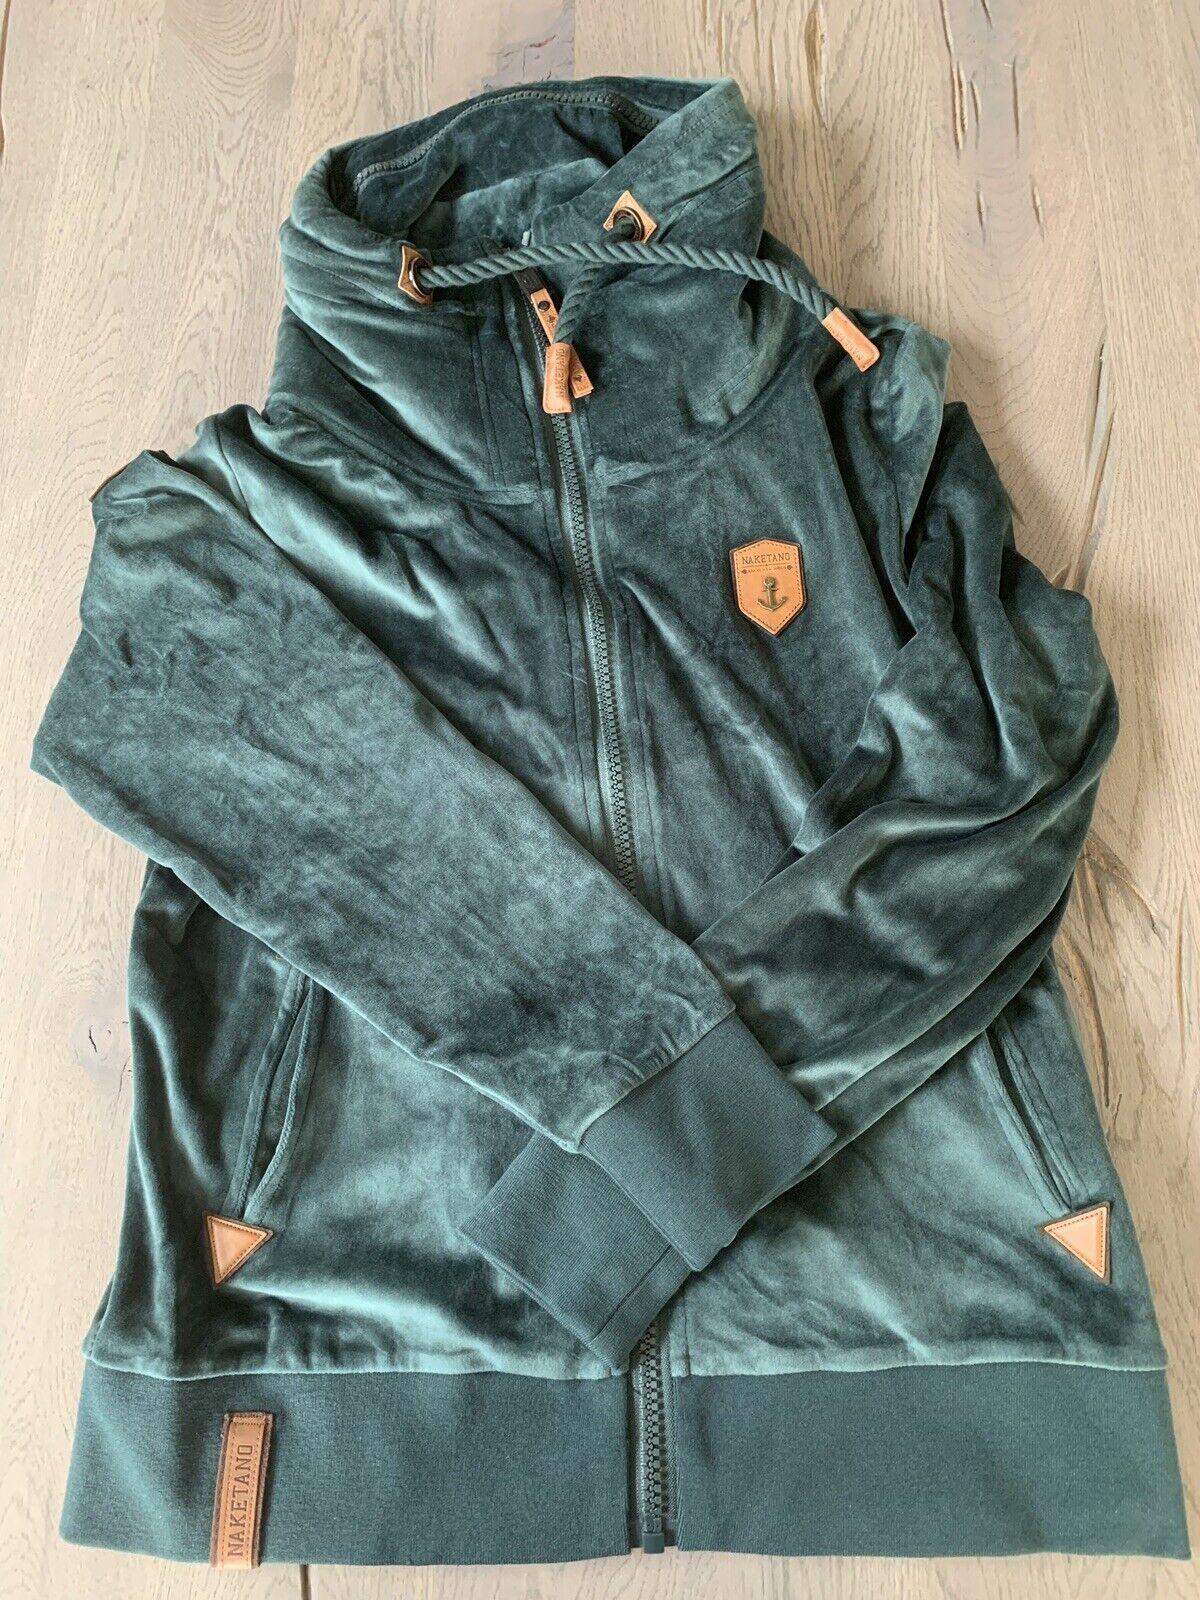 PGwear Sweatshirt From Father To günstig kaufen | CATCH by eBay